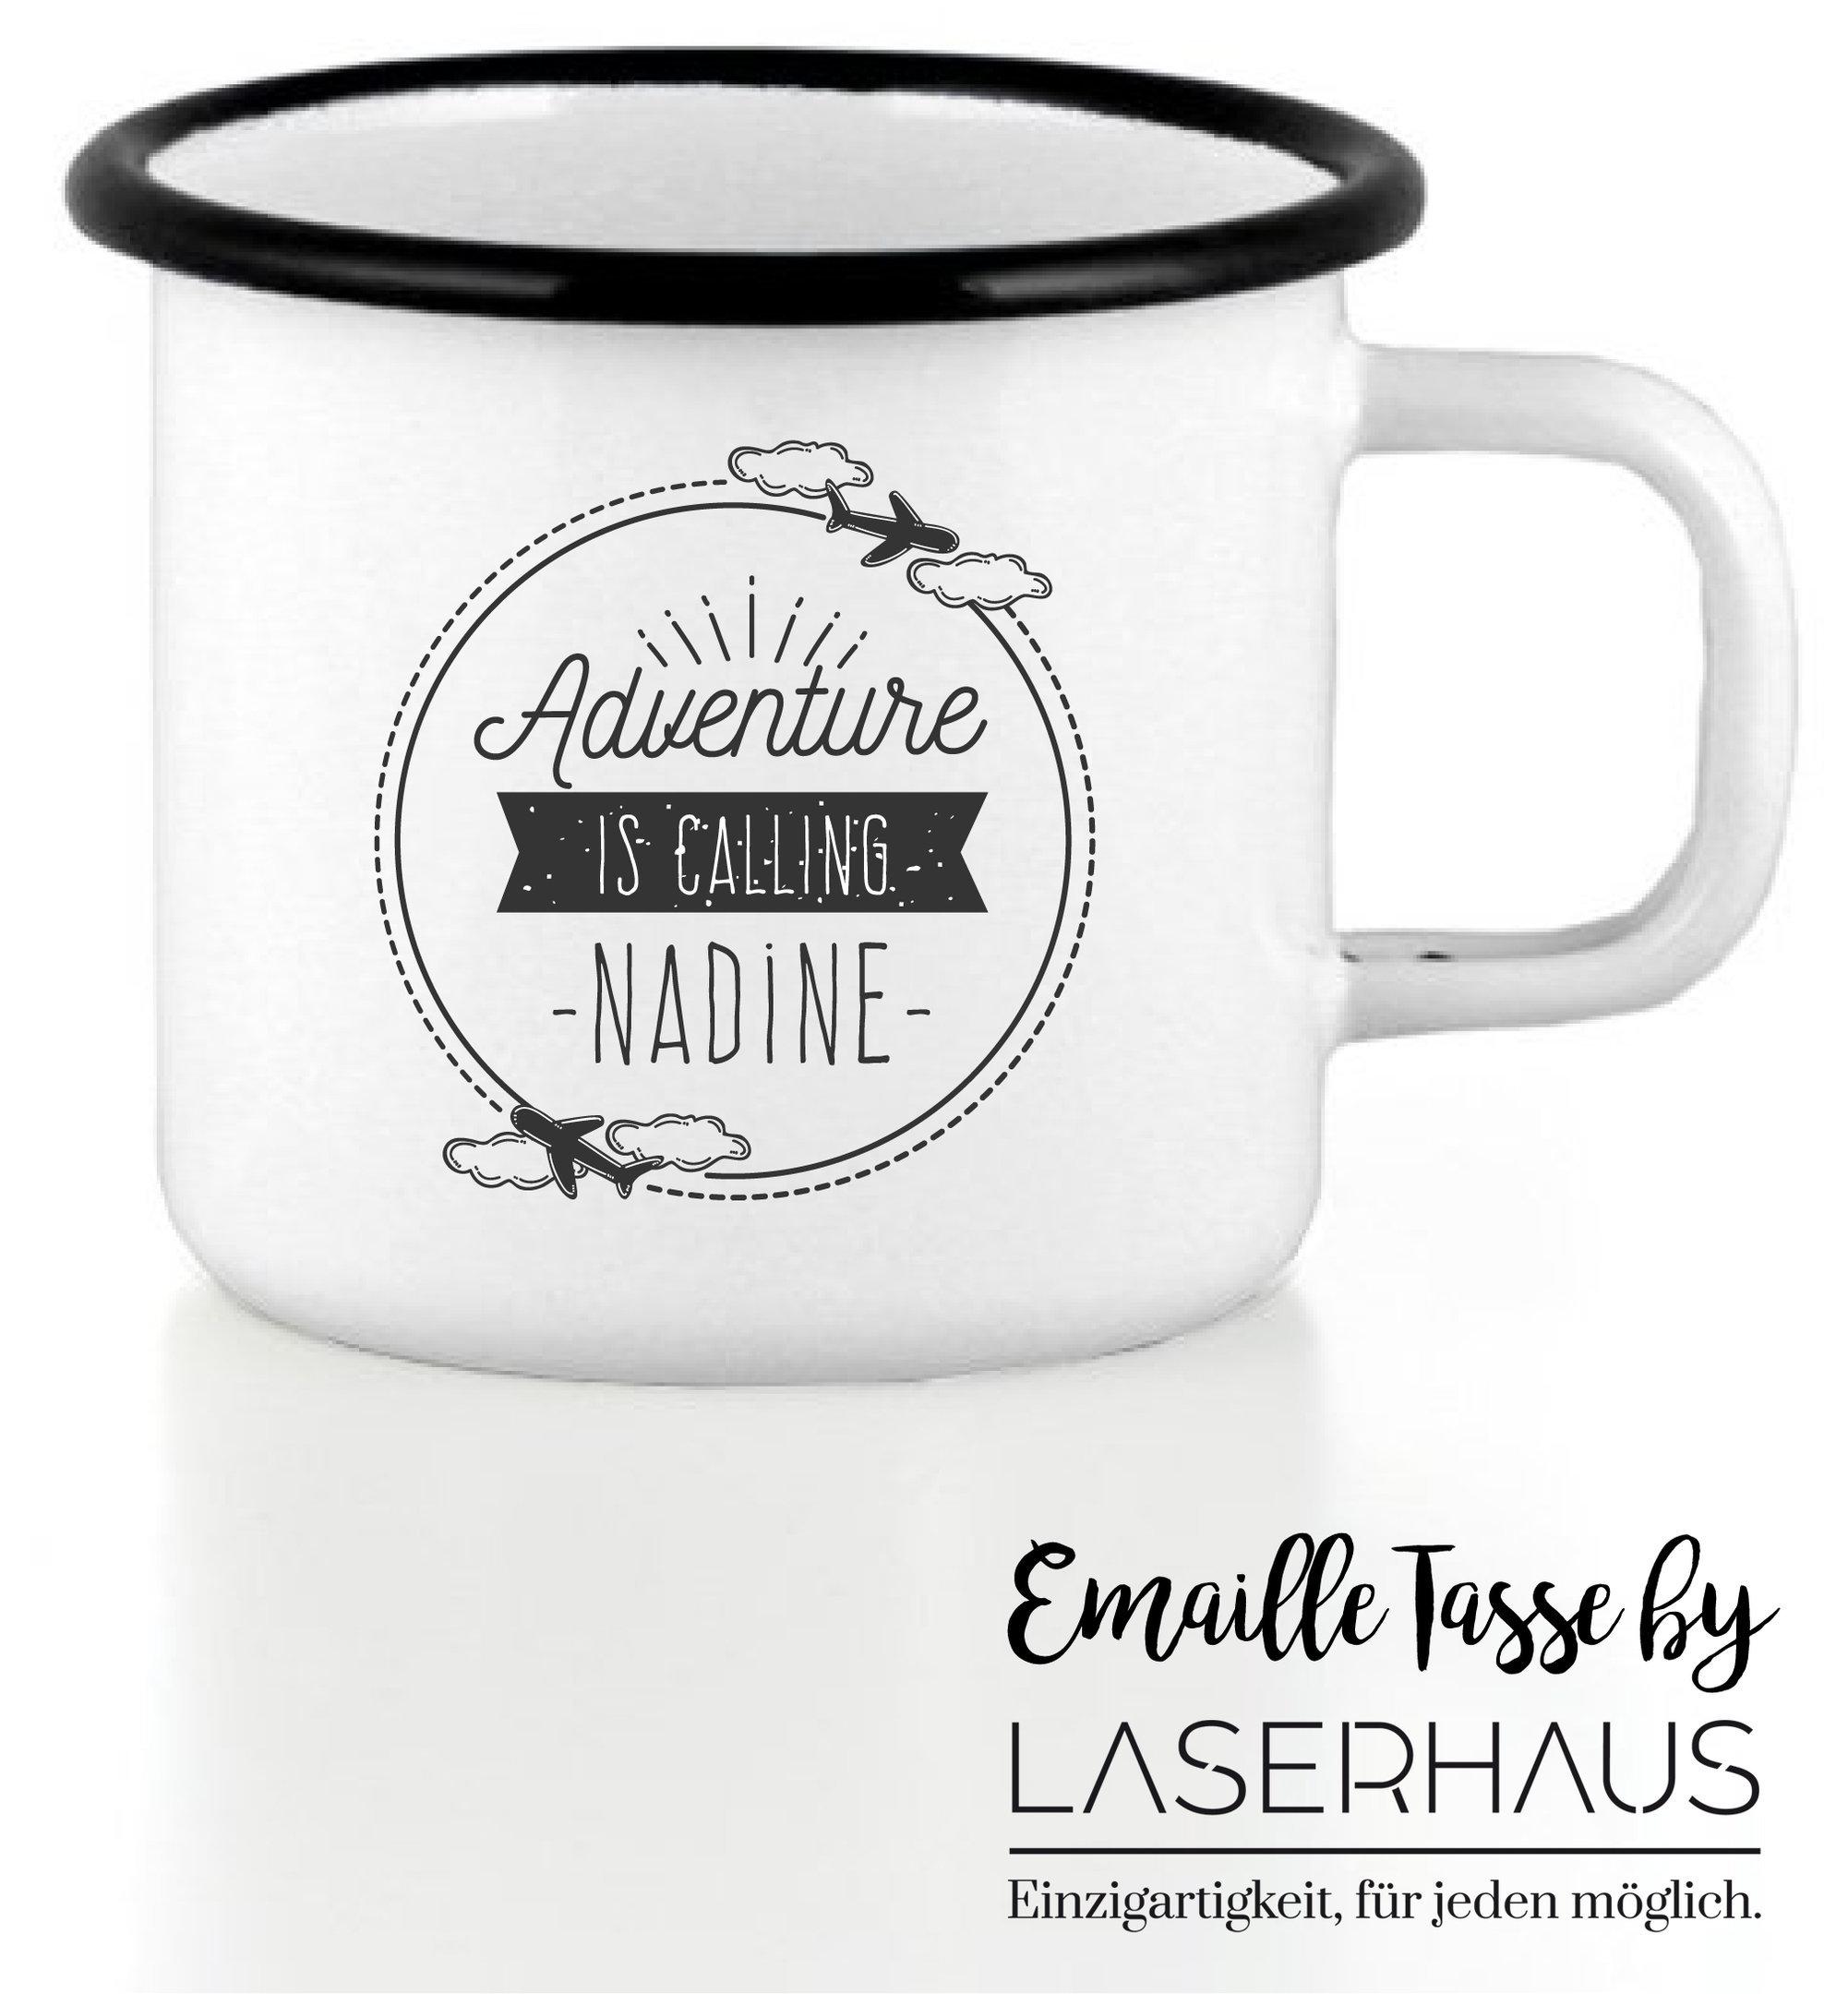 LASERHAUS GmbH